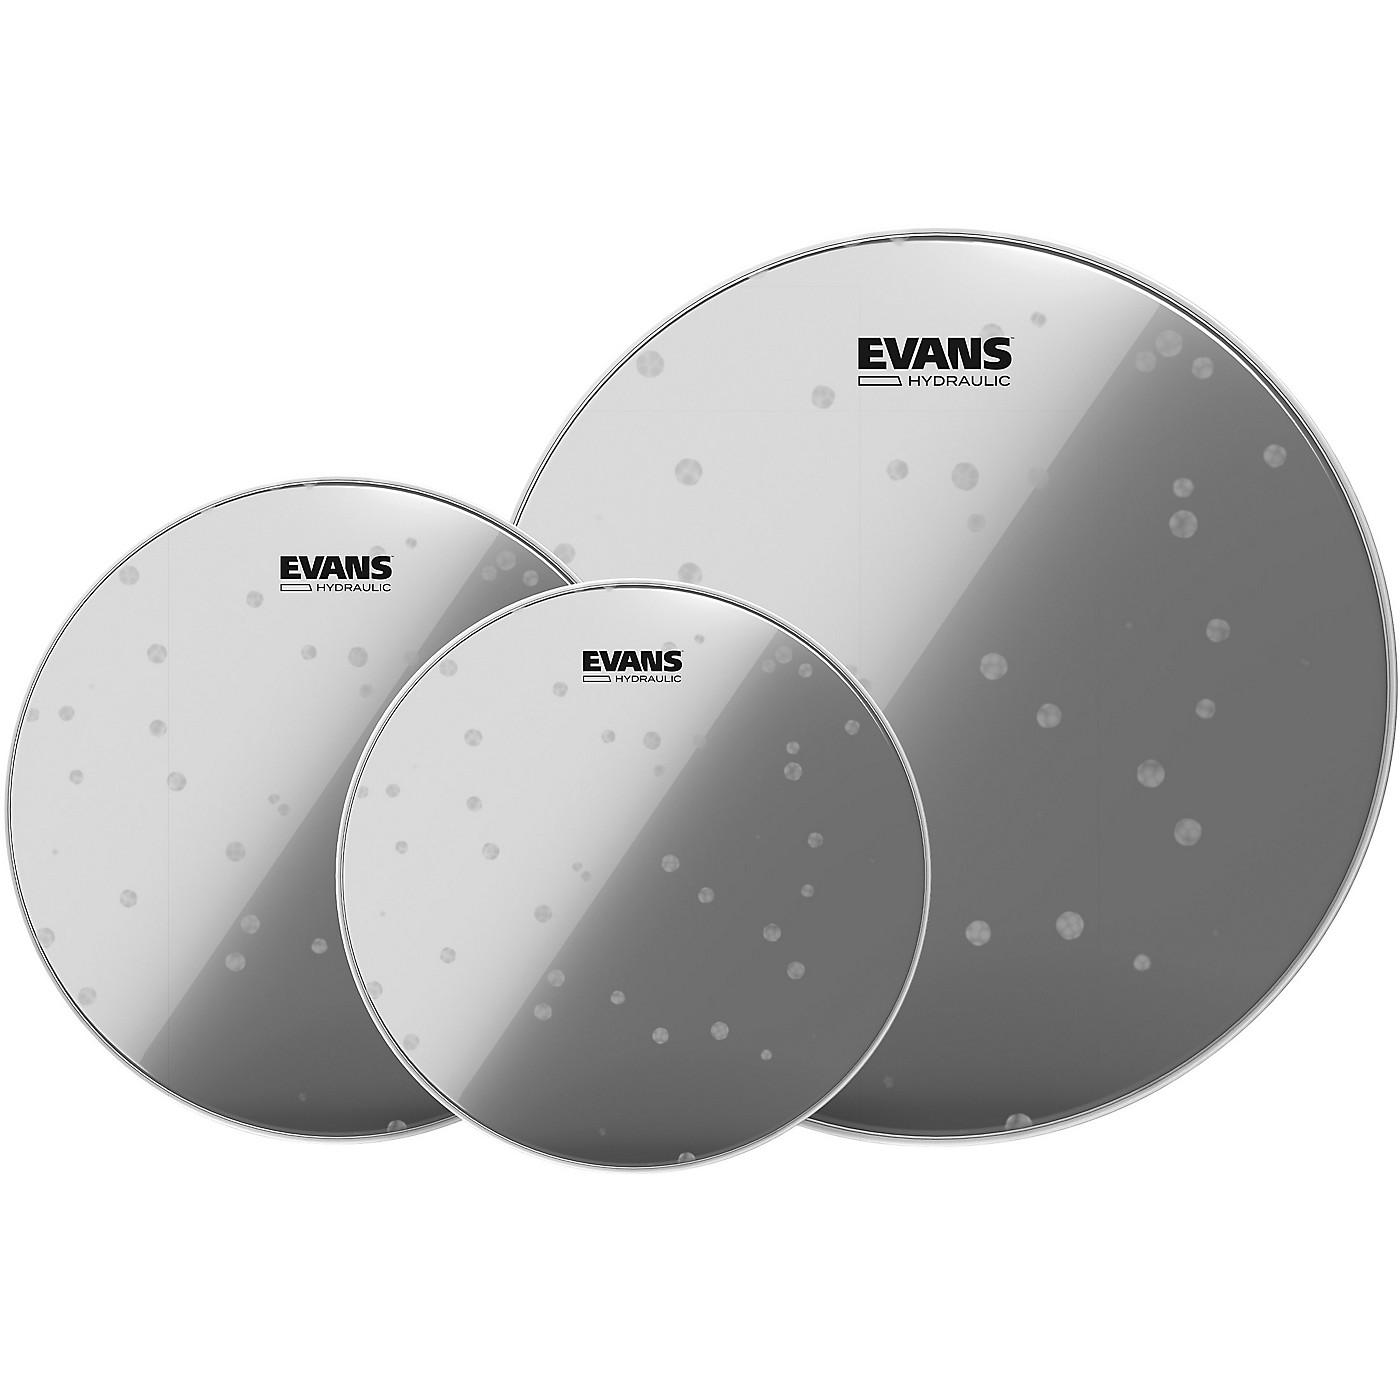 Evans Hydraulic Glass 12/13/16 Standard Drum Head Pack thumbnail